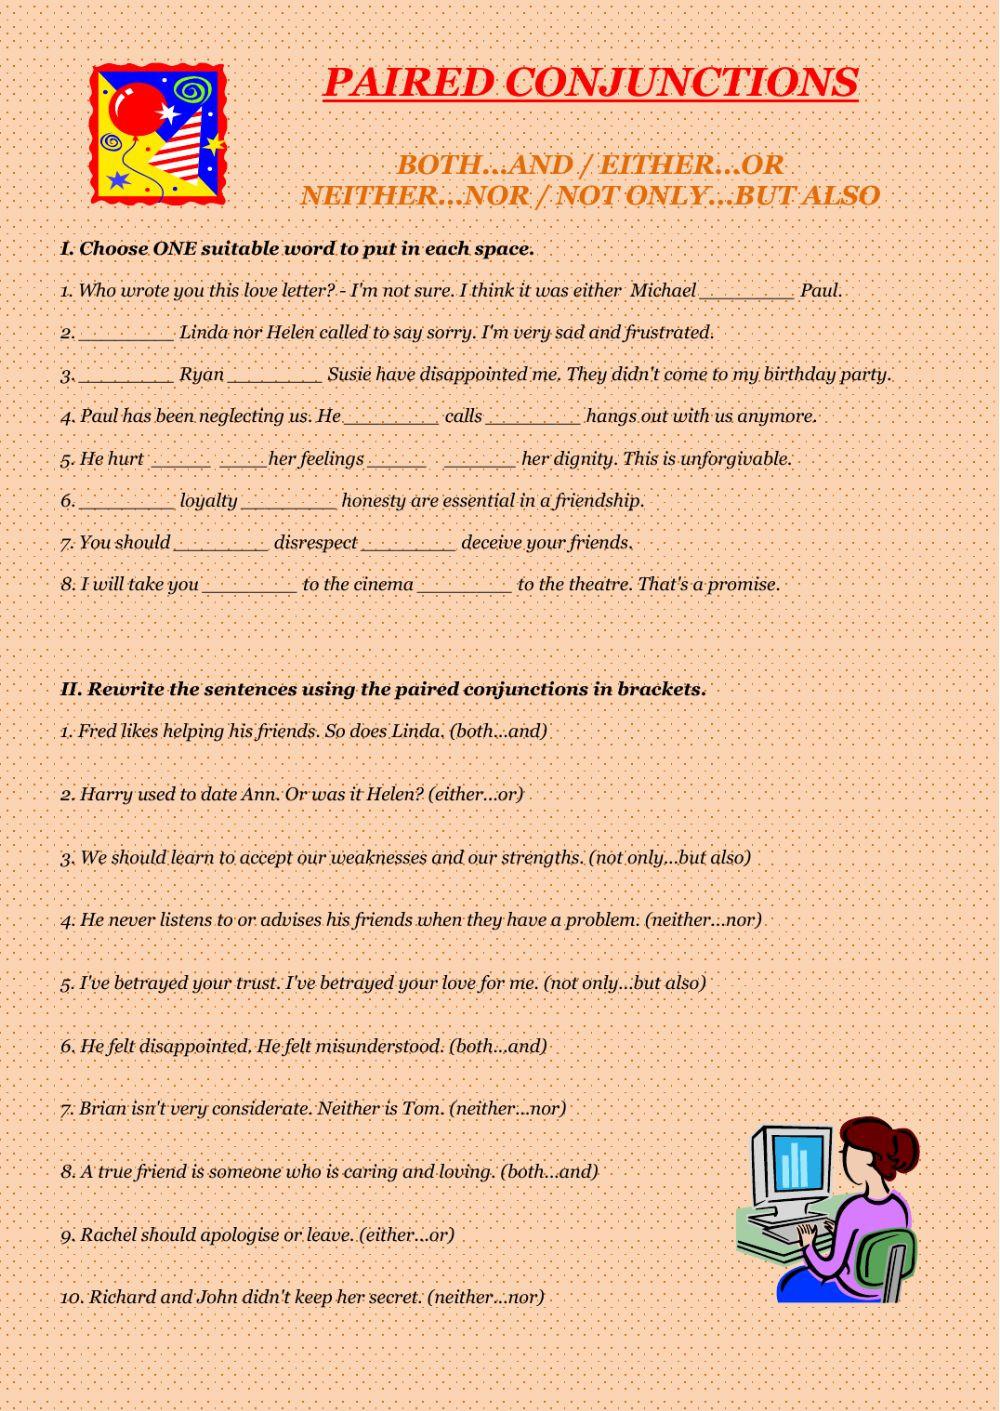 Correlative Conjunctions Worksheet 5th Grade Paired Conjunctions Conjunctions Worksheet